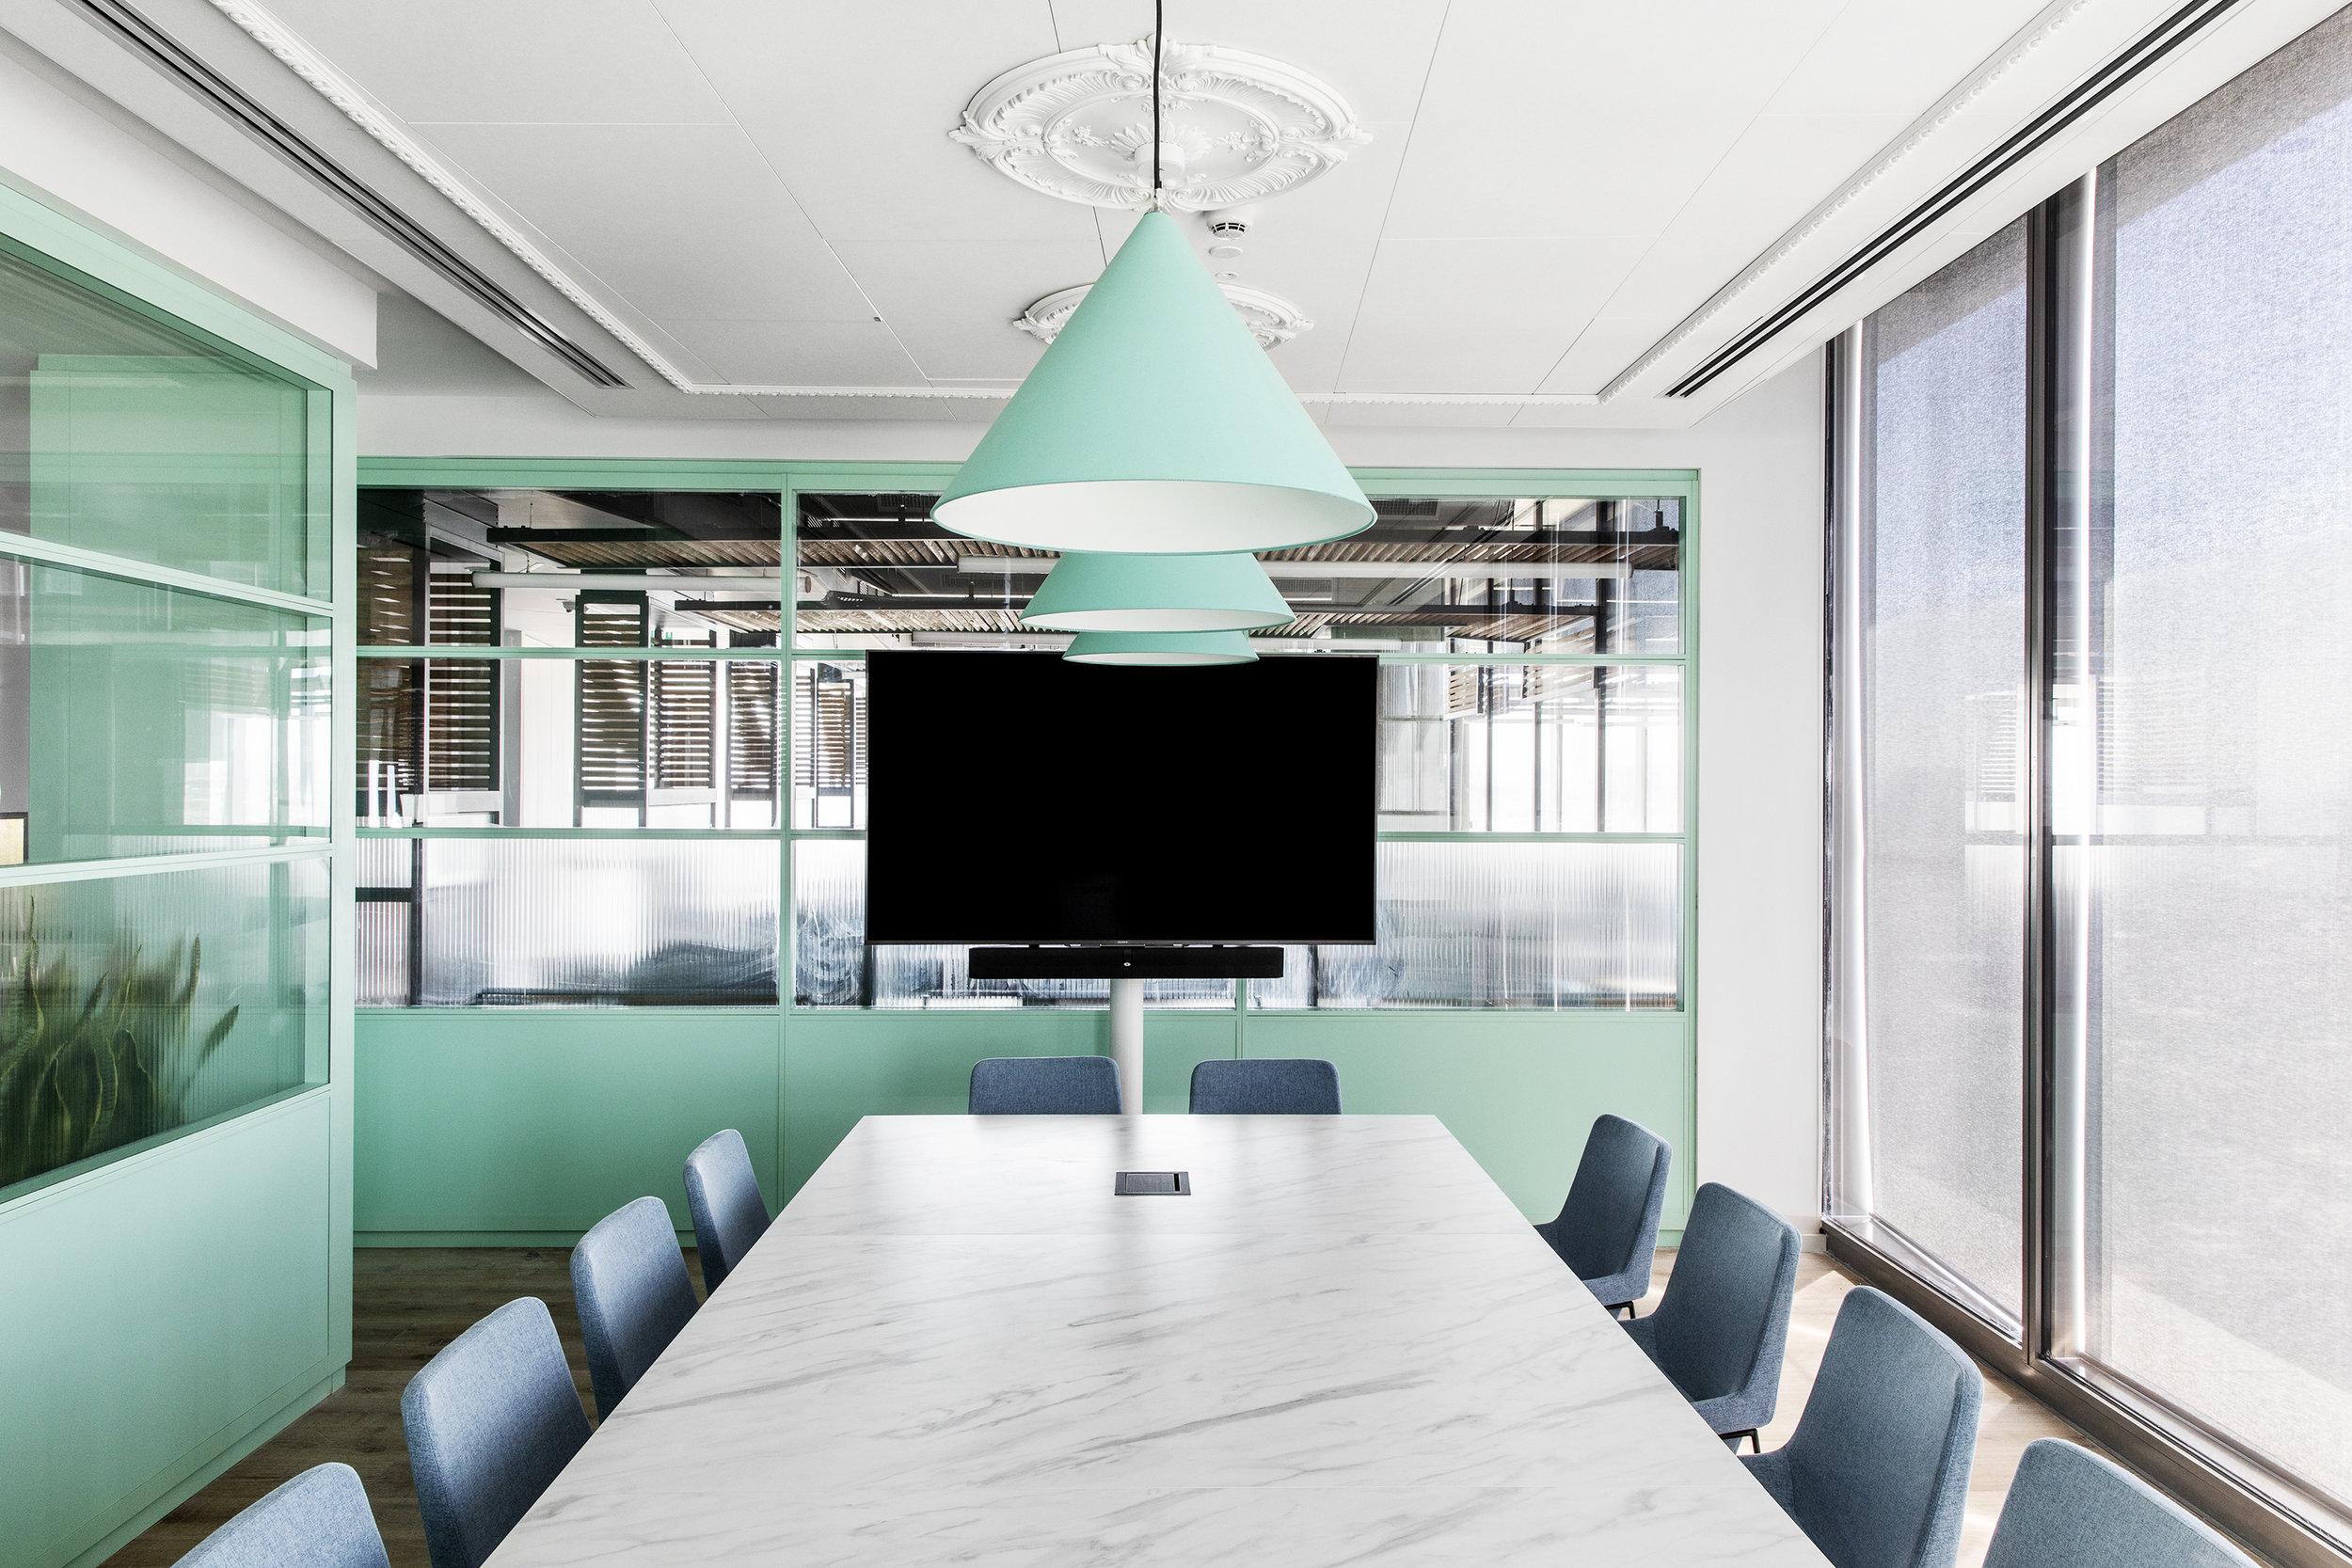 רואי דוד אדריכלות - אדריכל - נטורל אינטליג'נס - ROY DAVID - ARCHITECTURE - ARCHITECT - NI (26).jpg